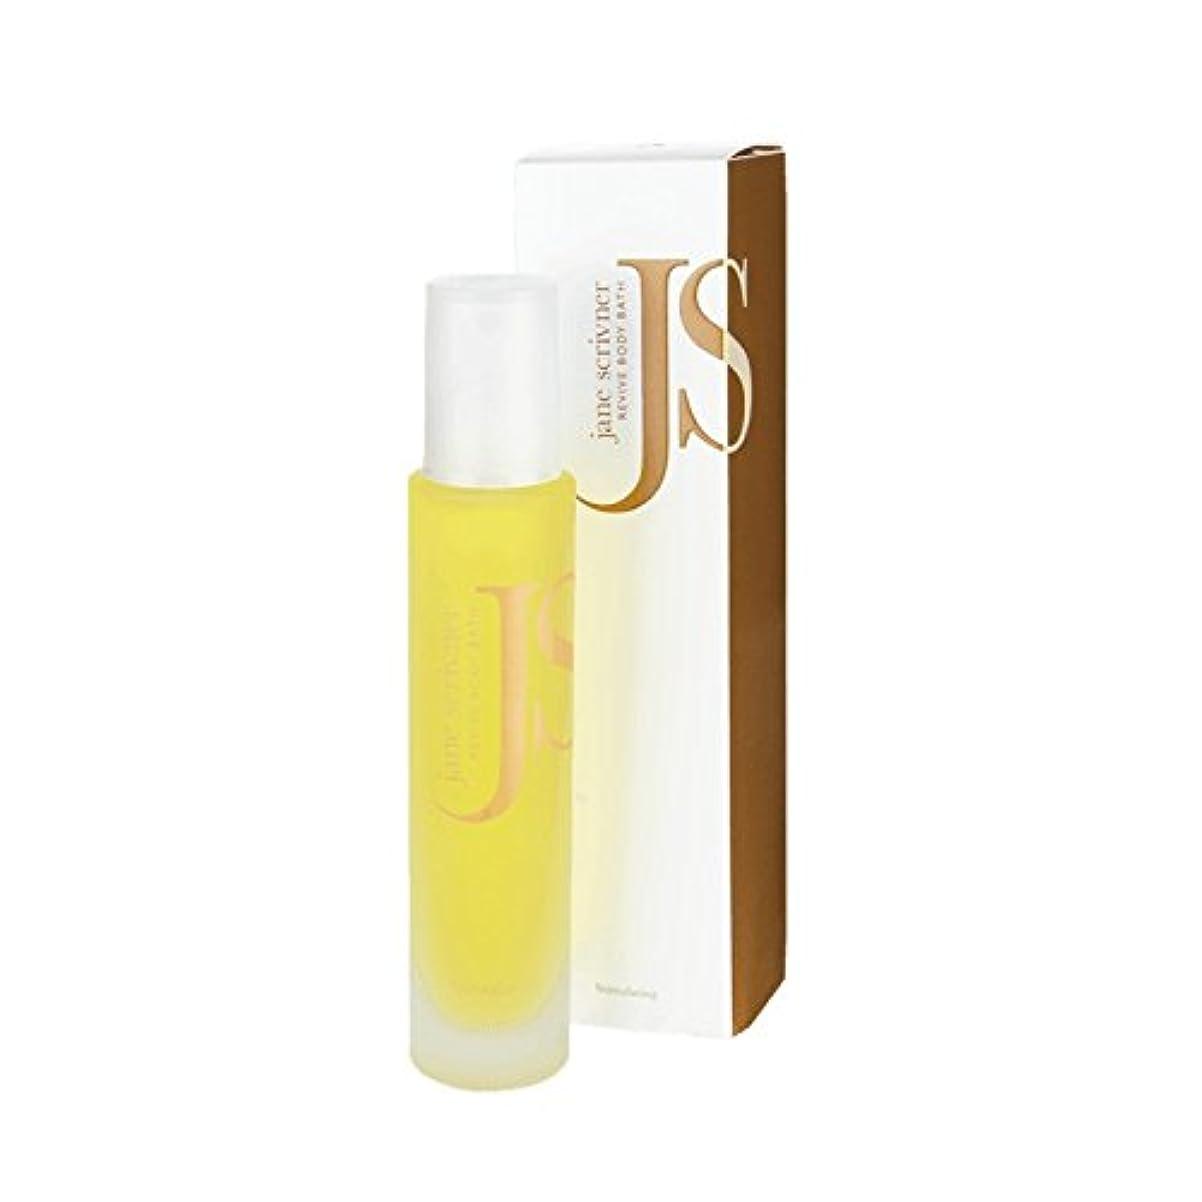 Jane Scrivner Body Bath Oil Revive 100ml (Pack of 2) - ジェーンScrivnerボディバスオイル100ミリリットルを復活させます (x2) [並行輸入品]